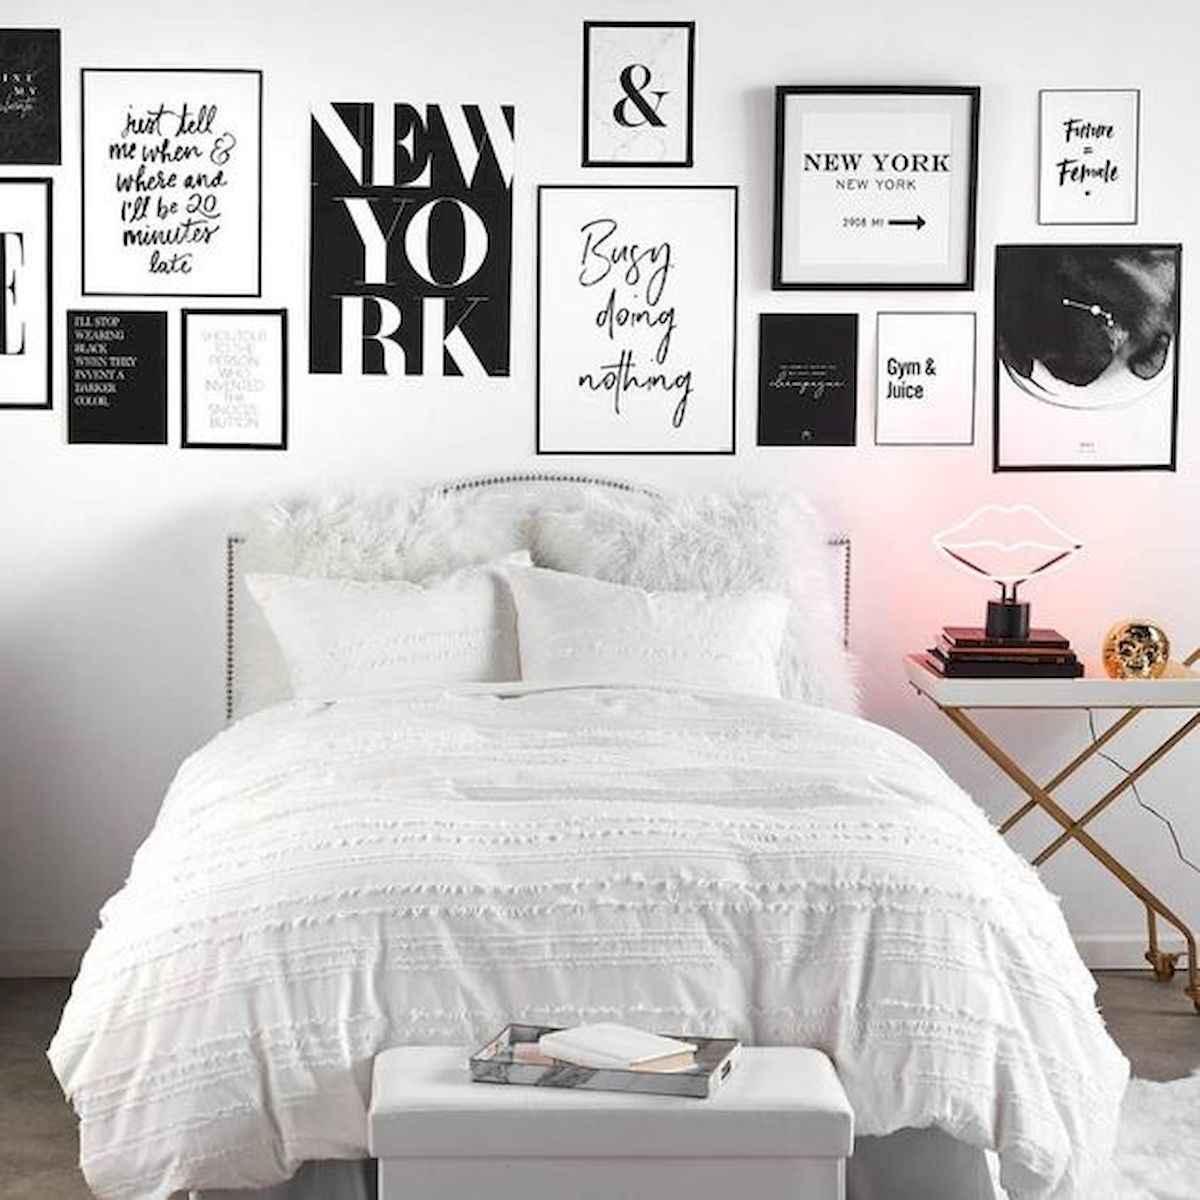 80 Fantastic Small Apartment Bedroom College Design Ideas and Decor (30)